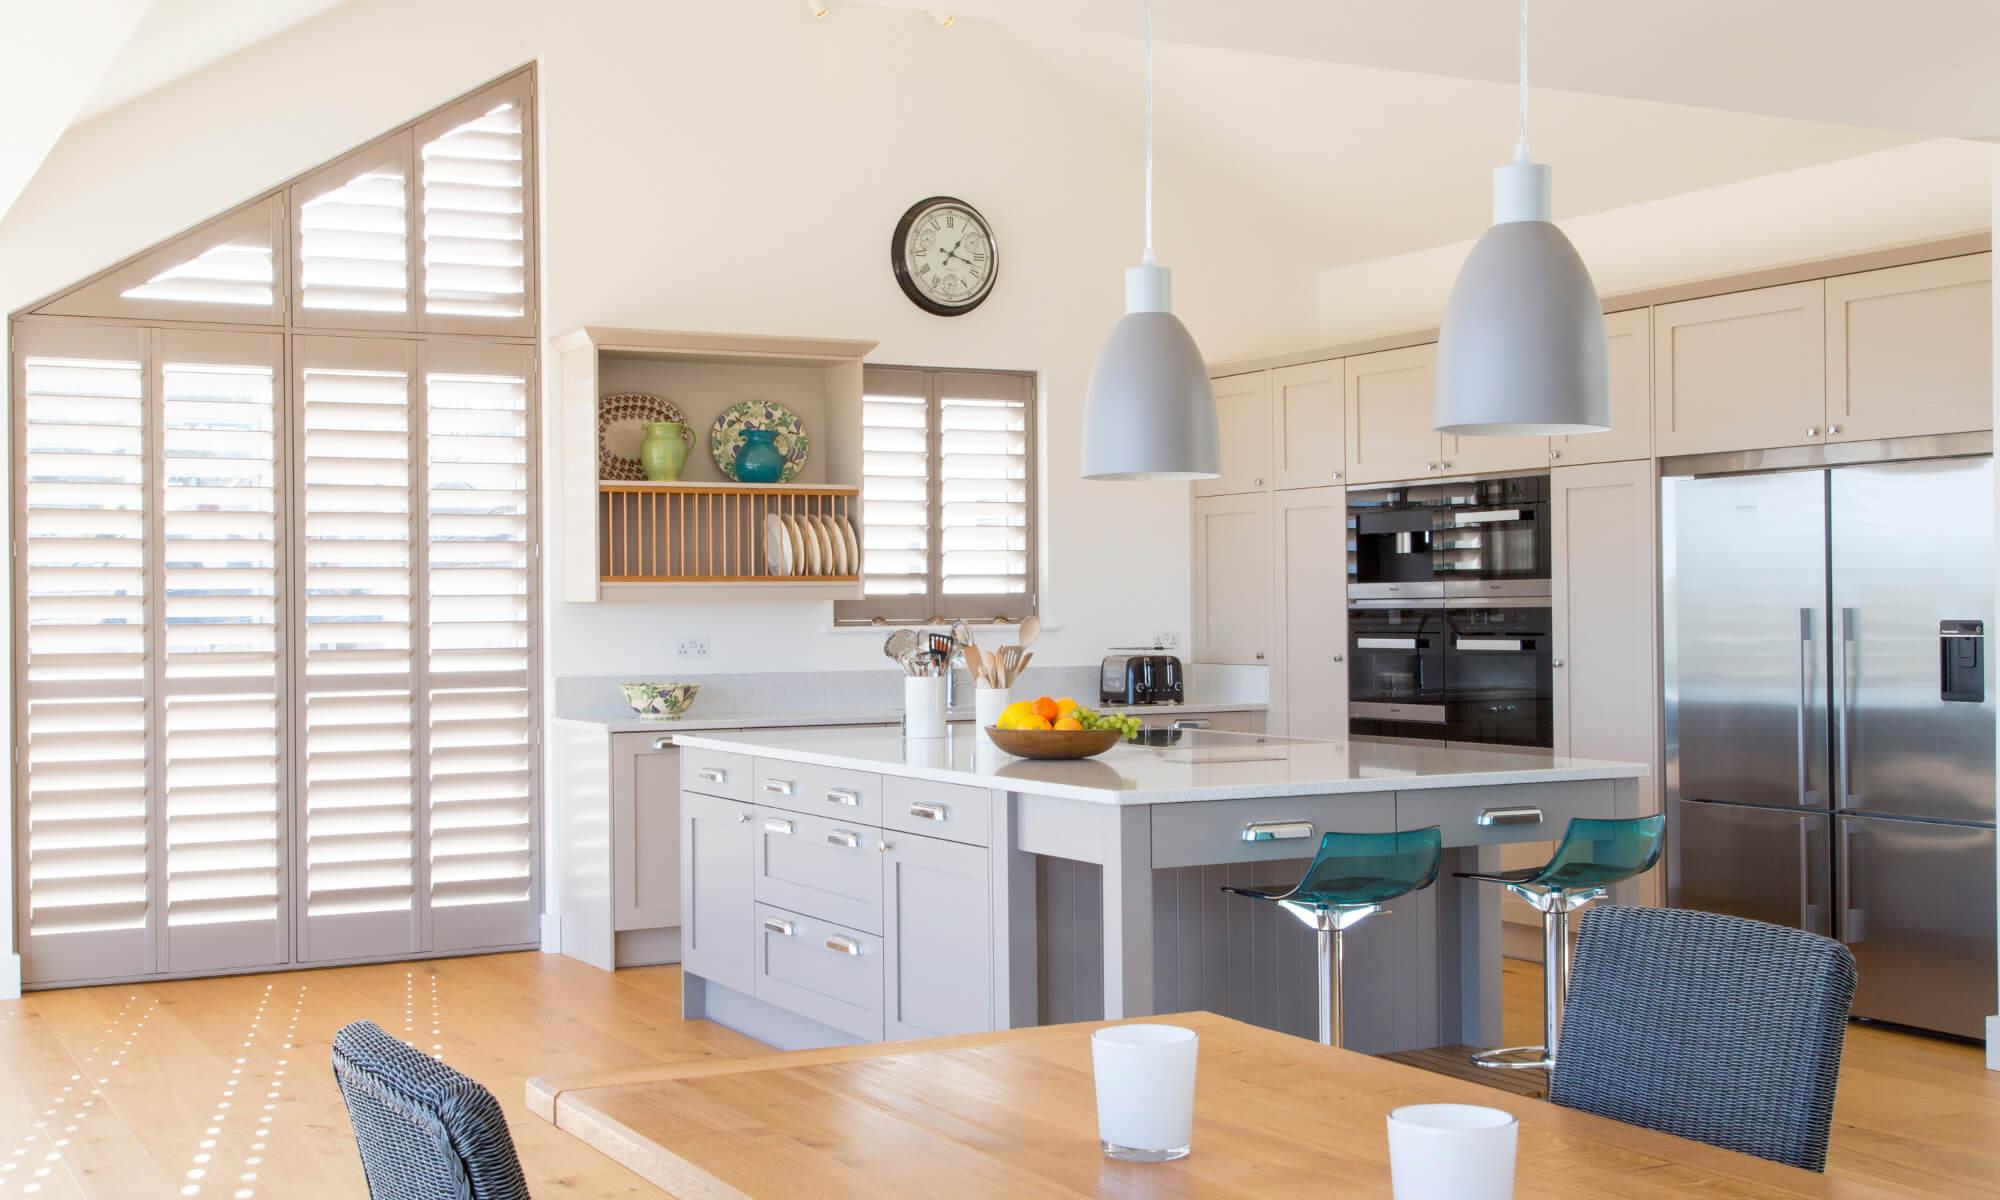 Design Interiors Ltd. Guernsey